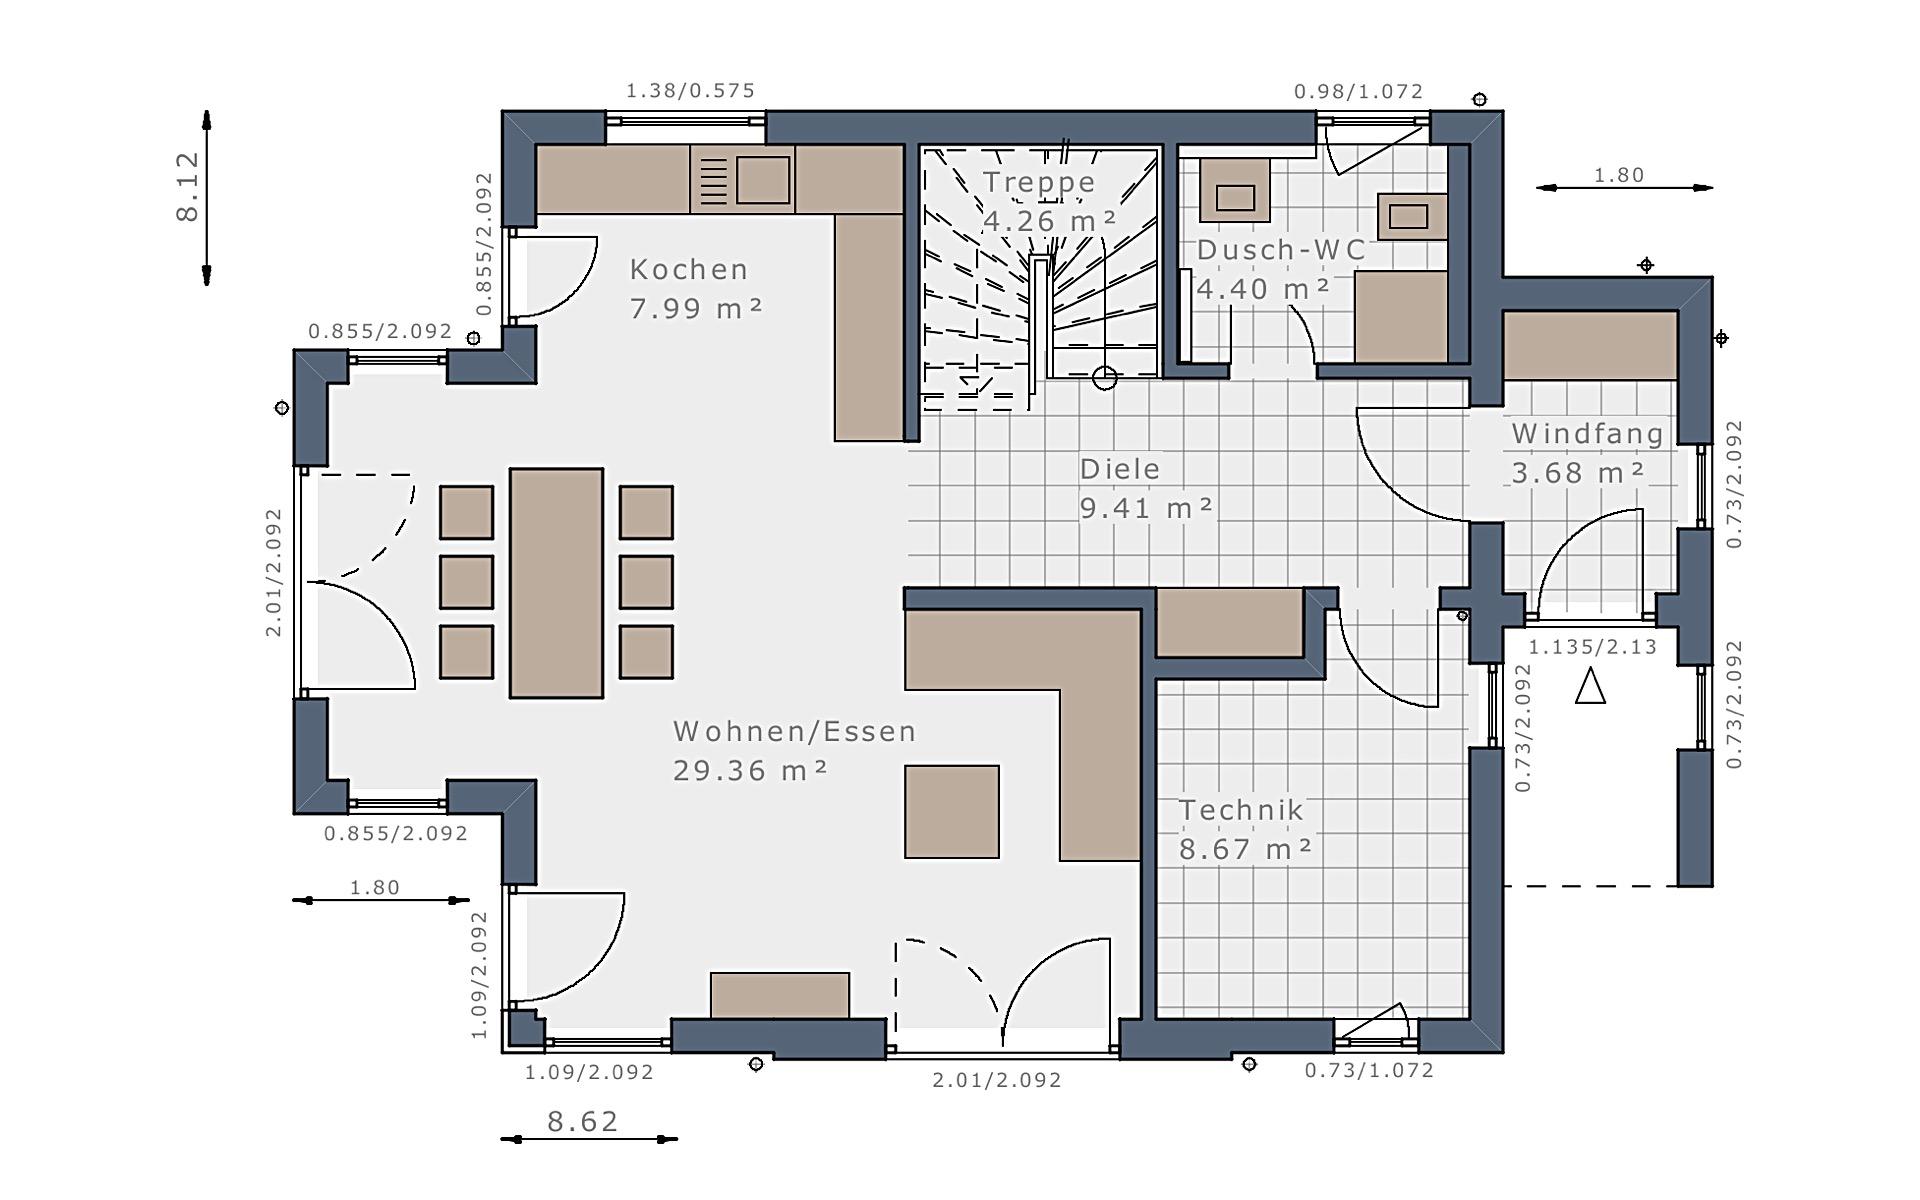 Erdgeschoss Solitaire-E-115 E4 von Schwabenhaus GmbH & Co. KG